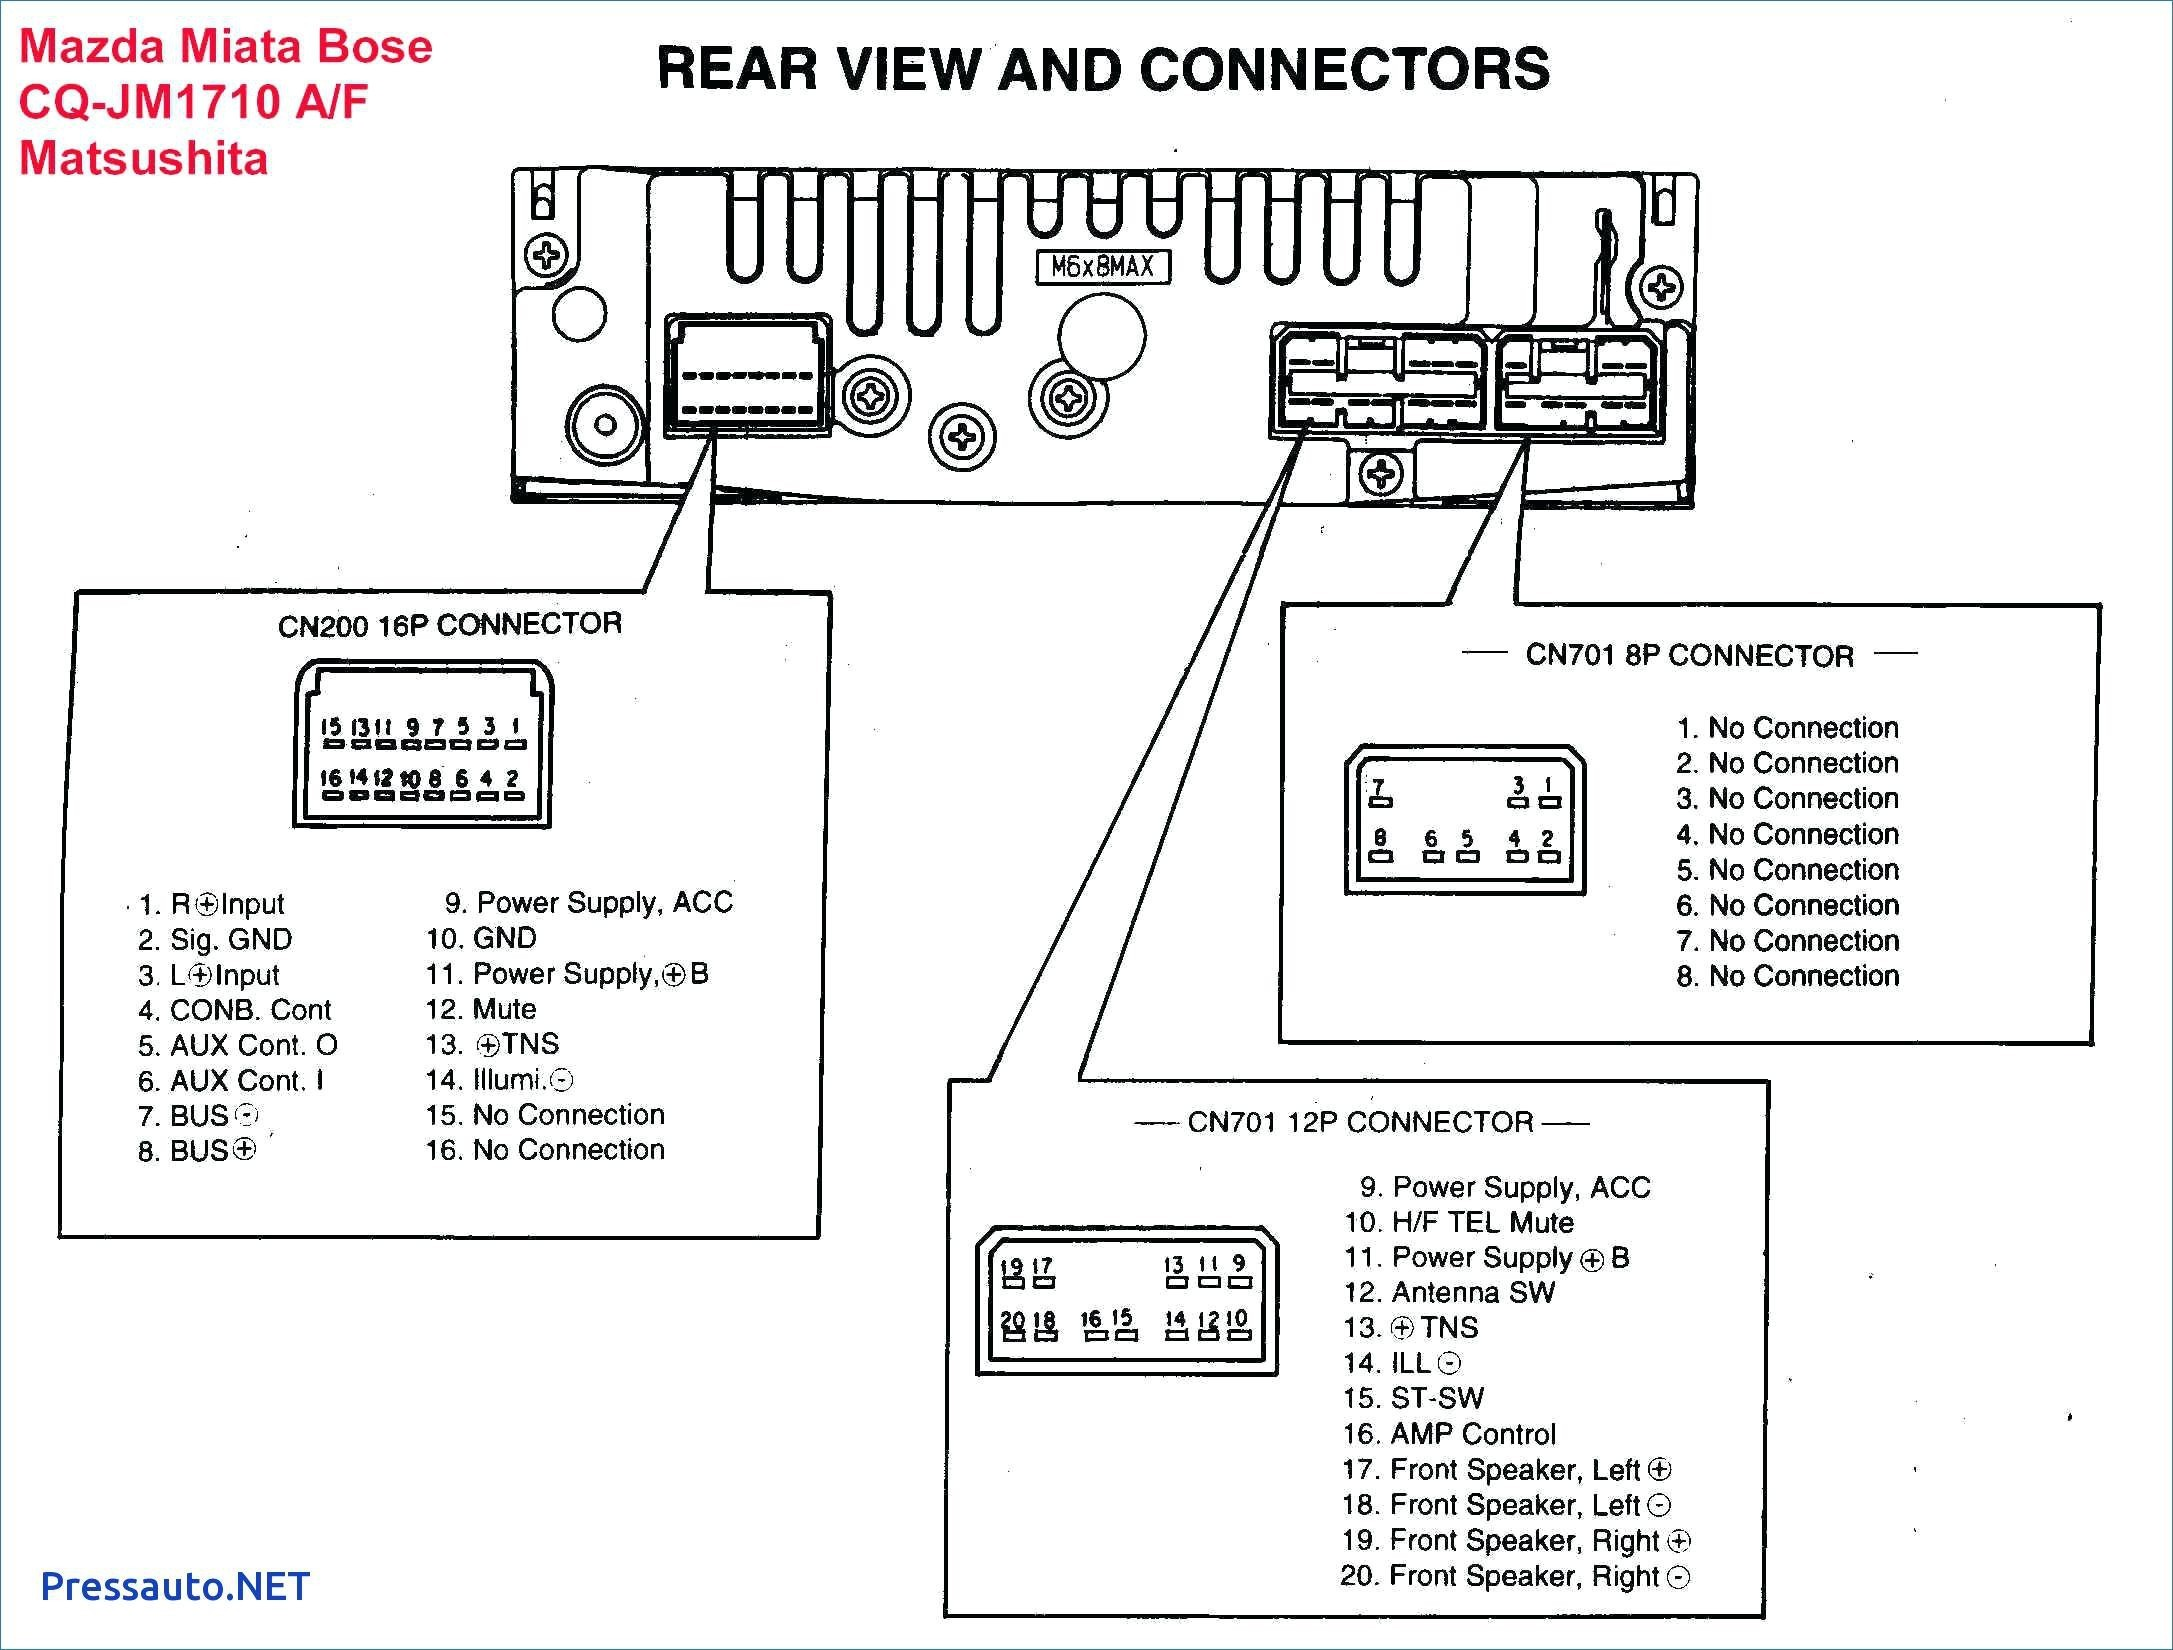 2002 Mazda Millenia Engine Diagram Mazda Engine Schematics Wiring Diagram toolbox Of 2002 Mazda Millenia Engine Diagram